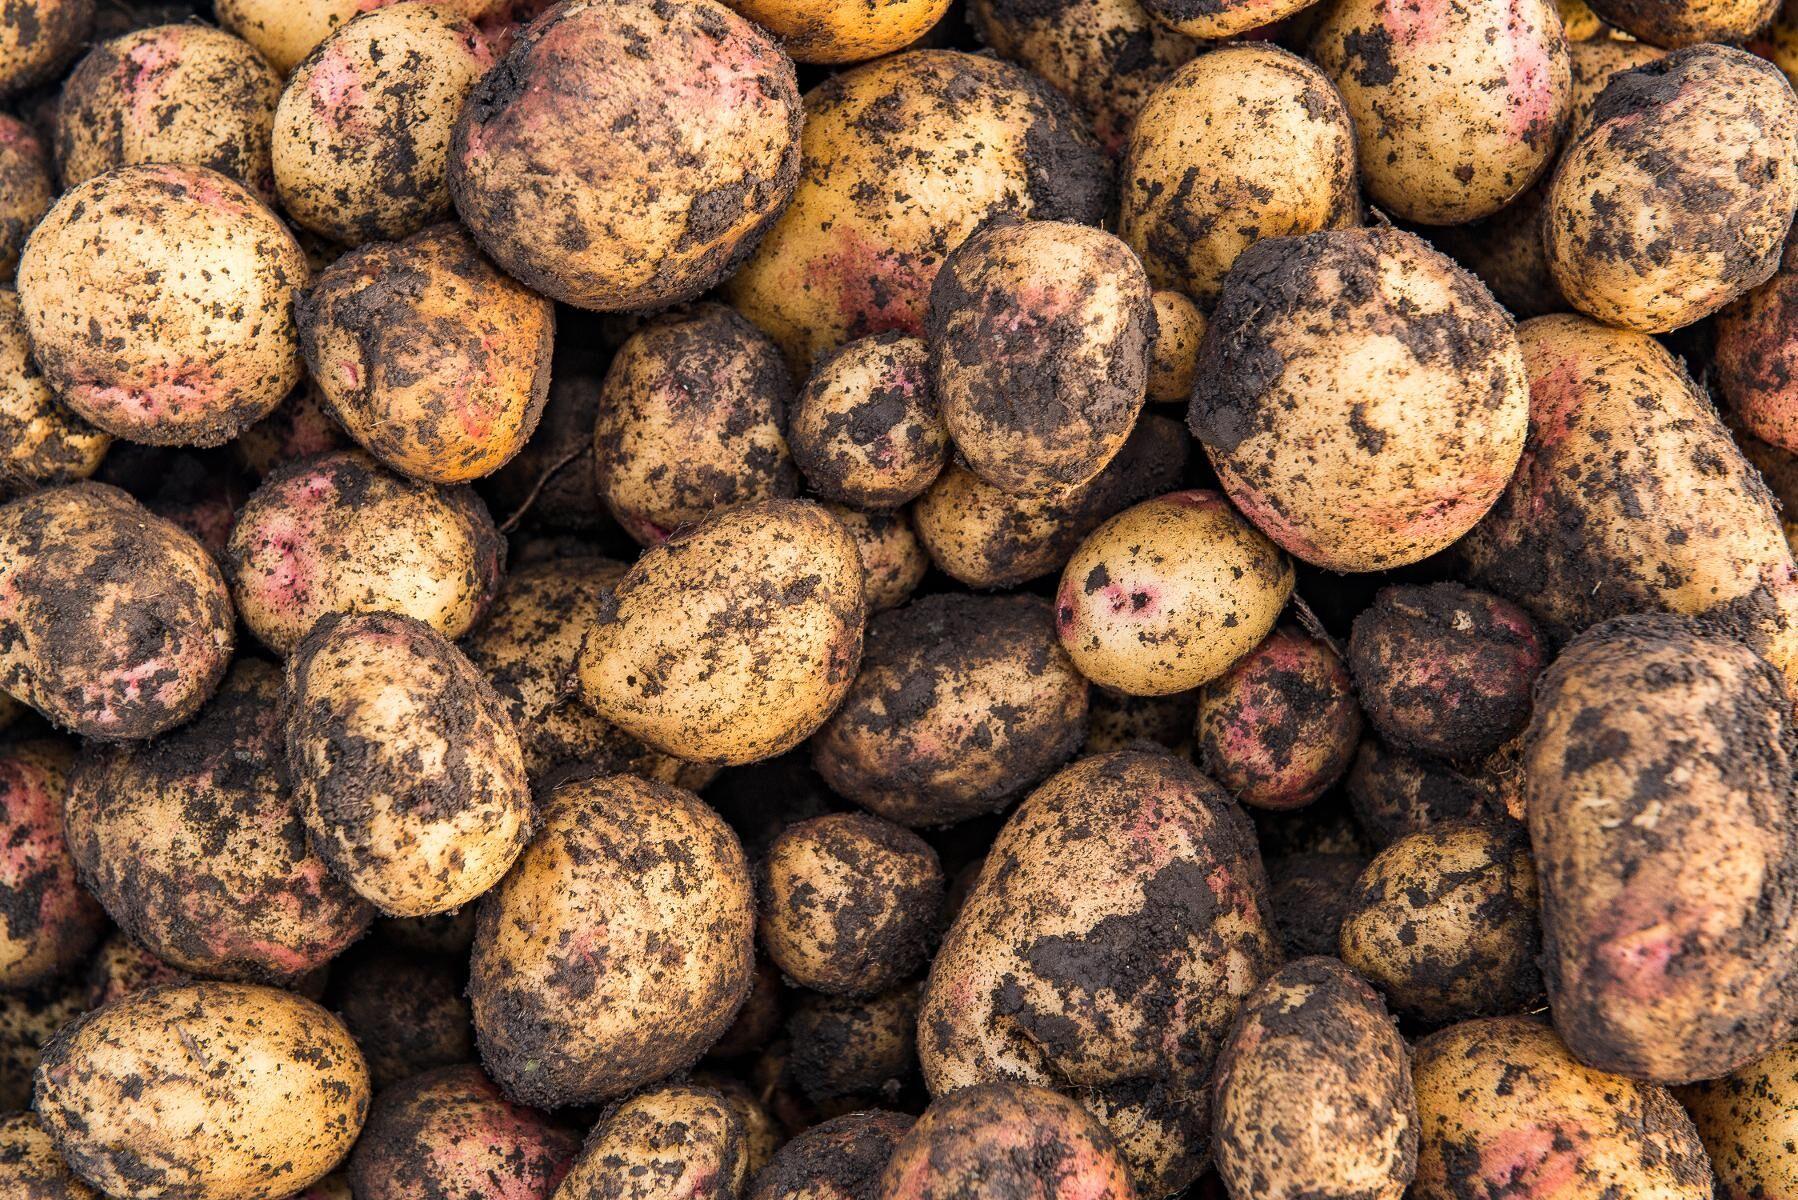 Nyplockad ekologisk potatis. Arkivbild.